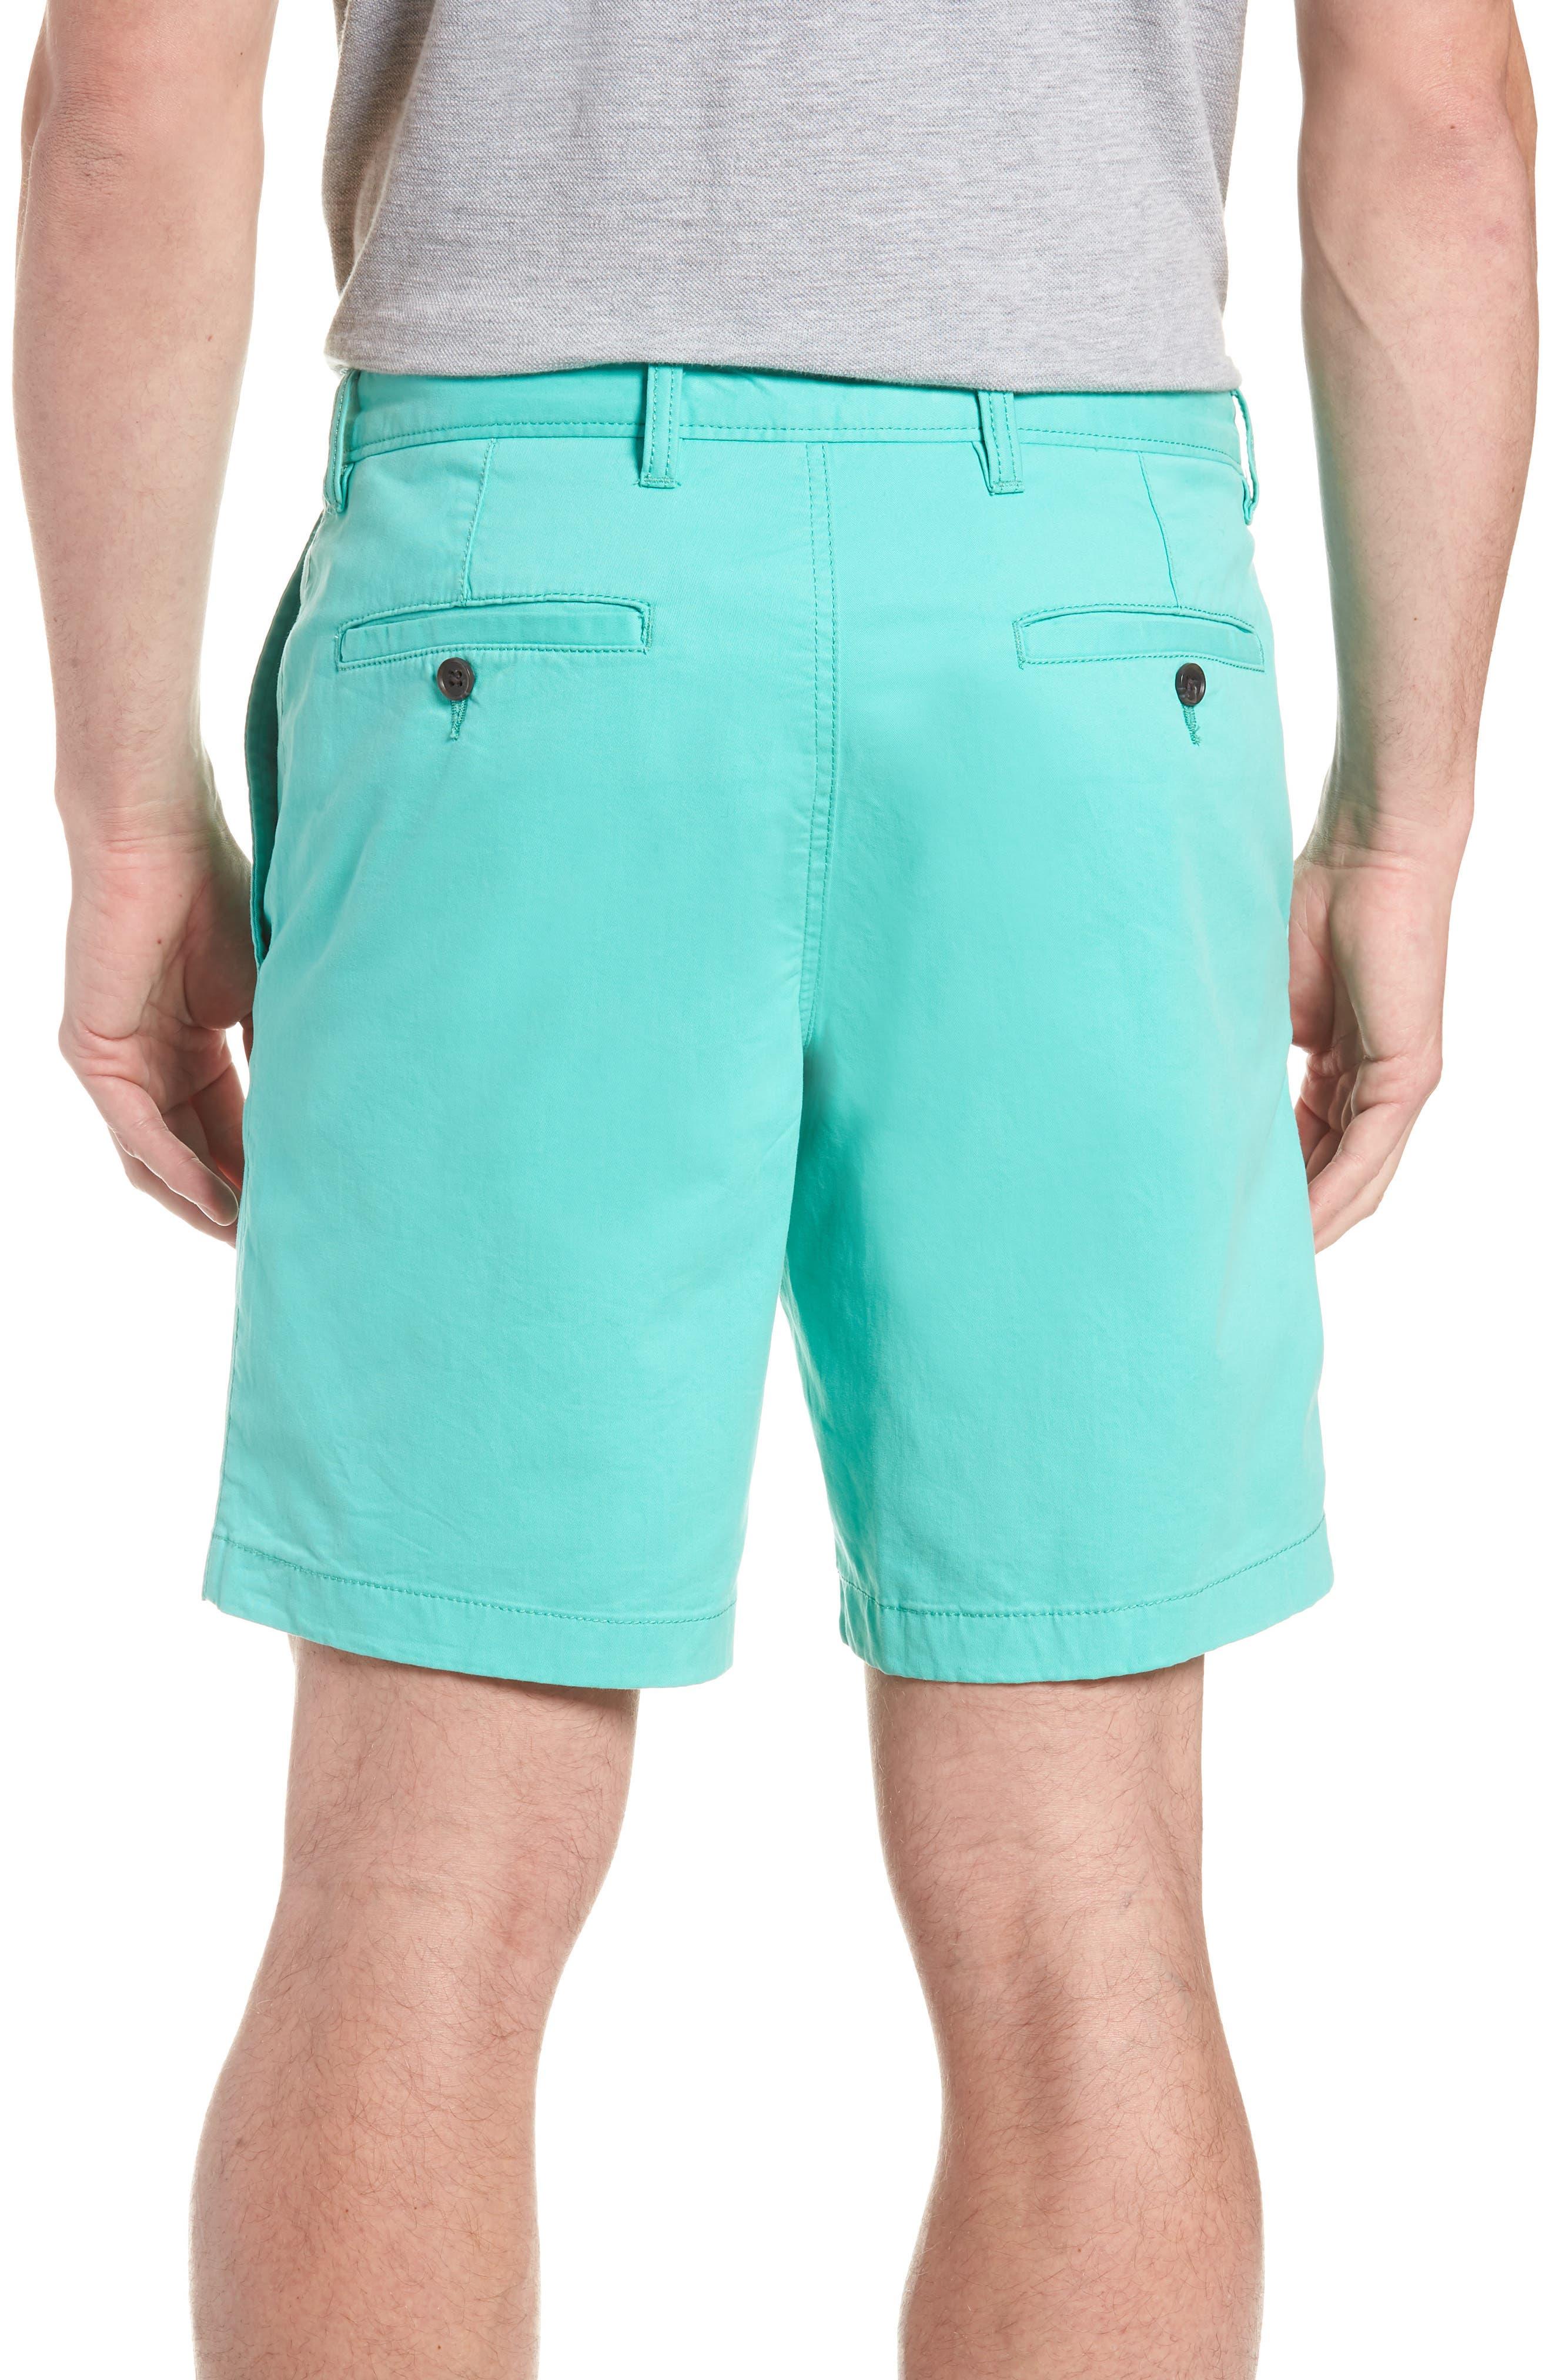 Ballard Slim Fit Stretch Chino 9-Inch Shorts,                             Alternate thumbnail 2, color,                             Green Largo